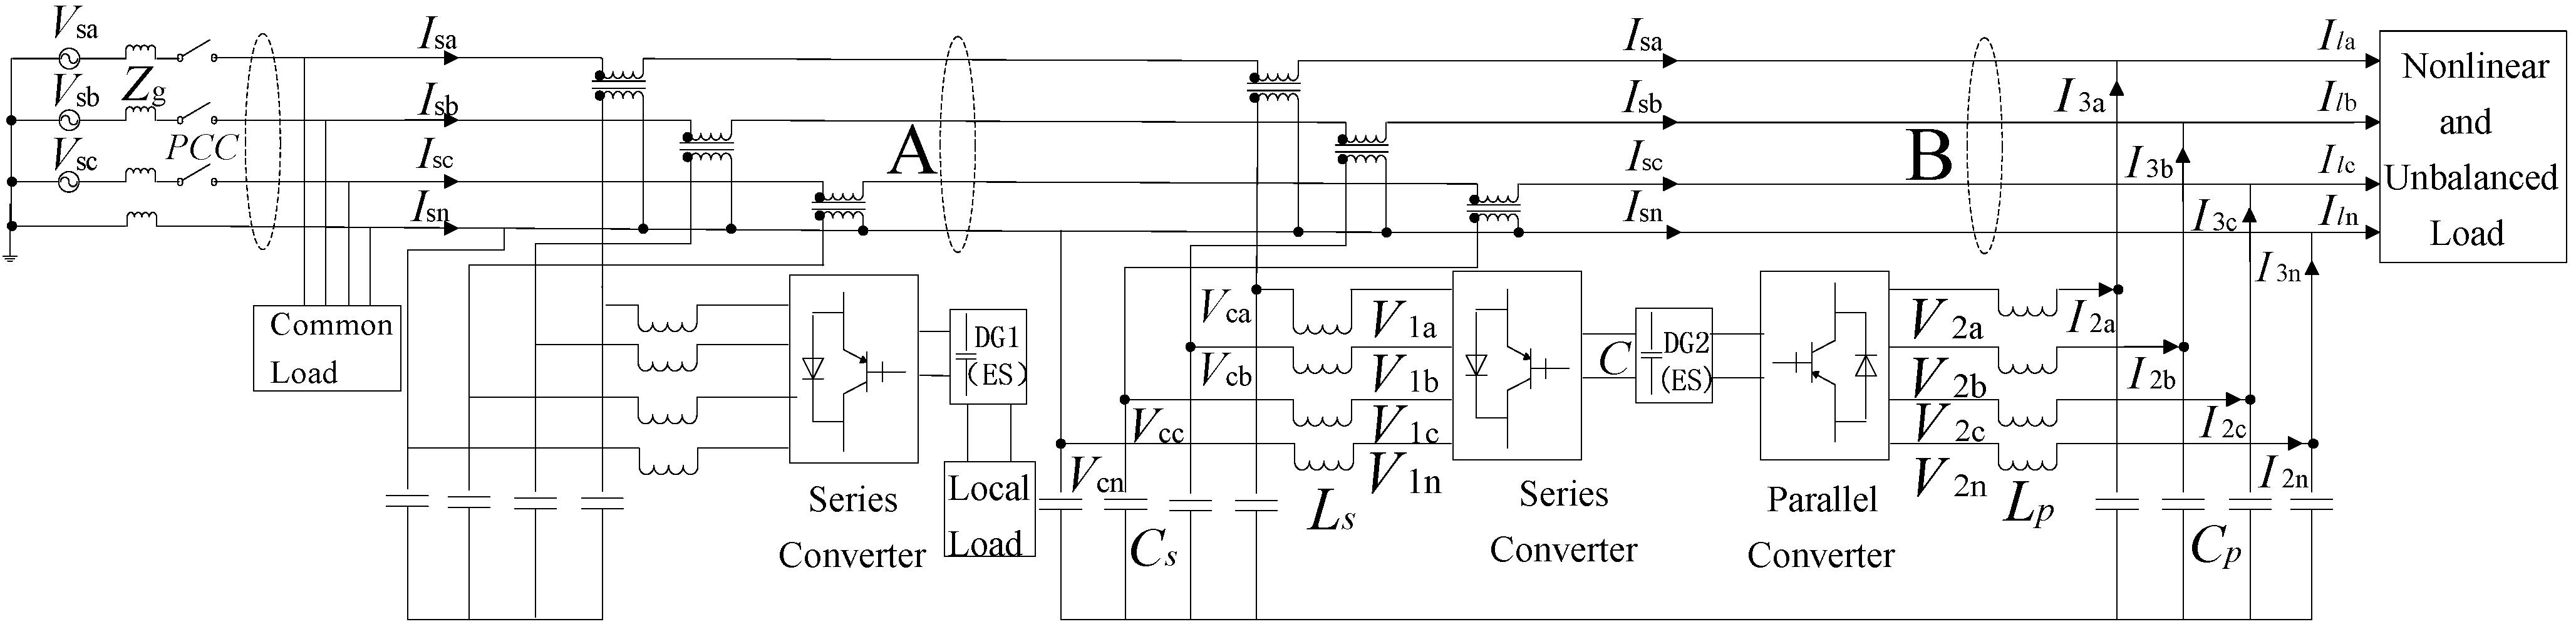 isb 235 wiring diagram 2001